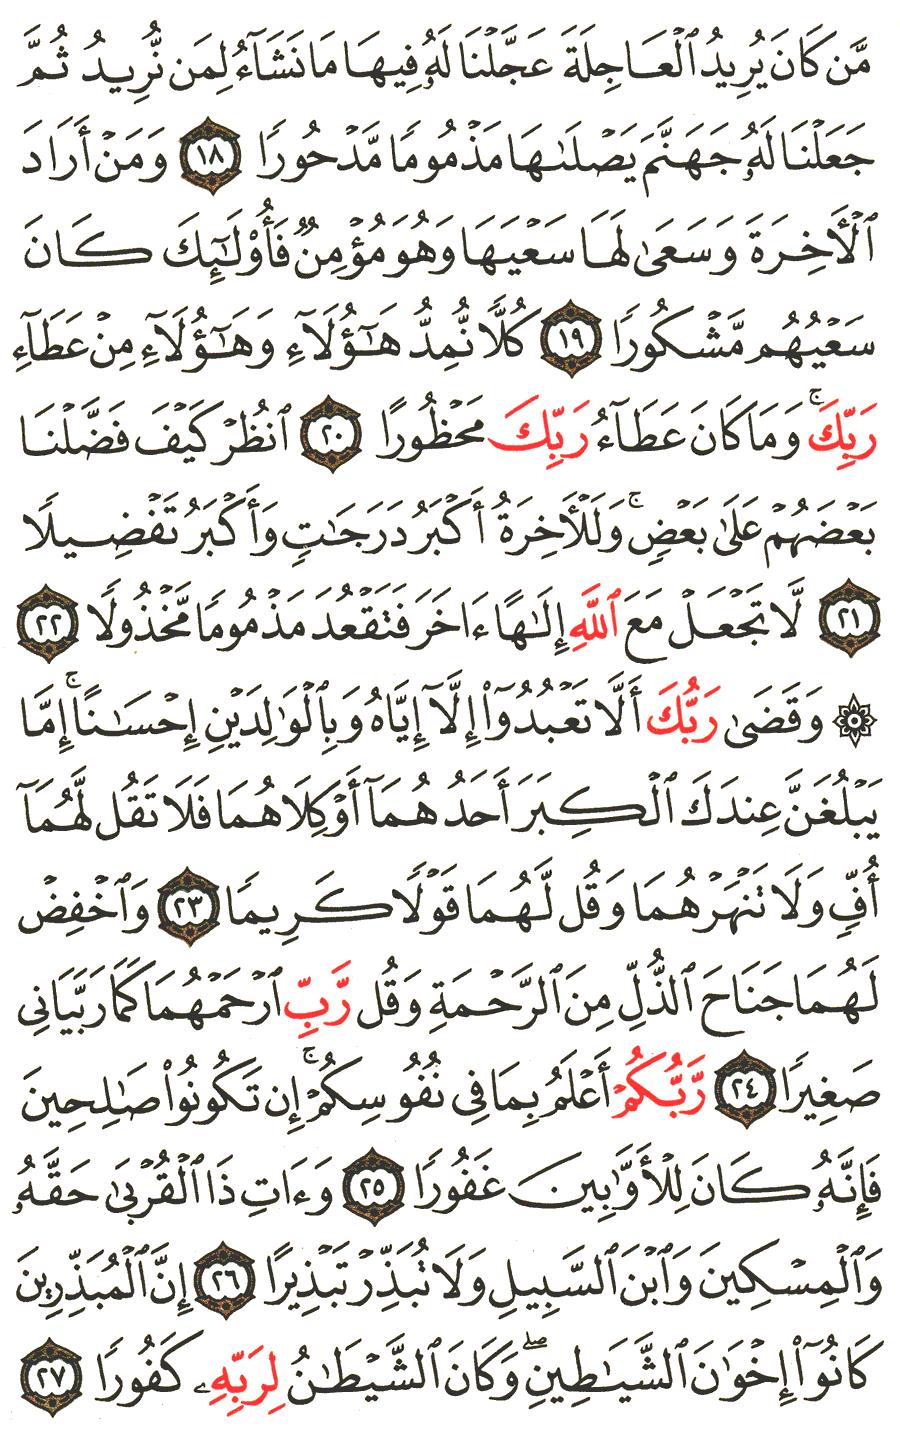 al+isra+ayat+26,+27,+28,+29+ | Tafsirq.com